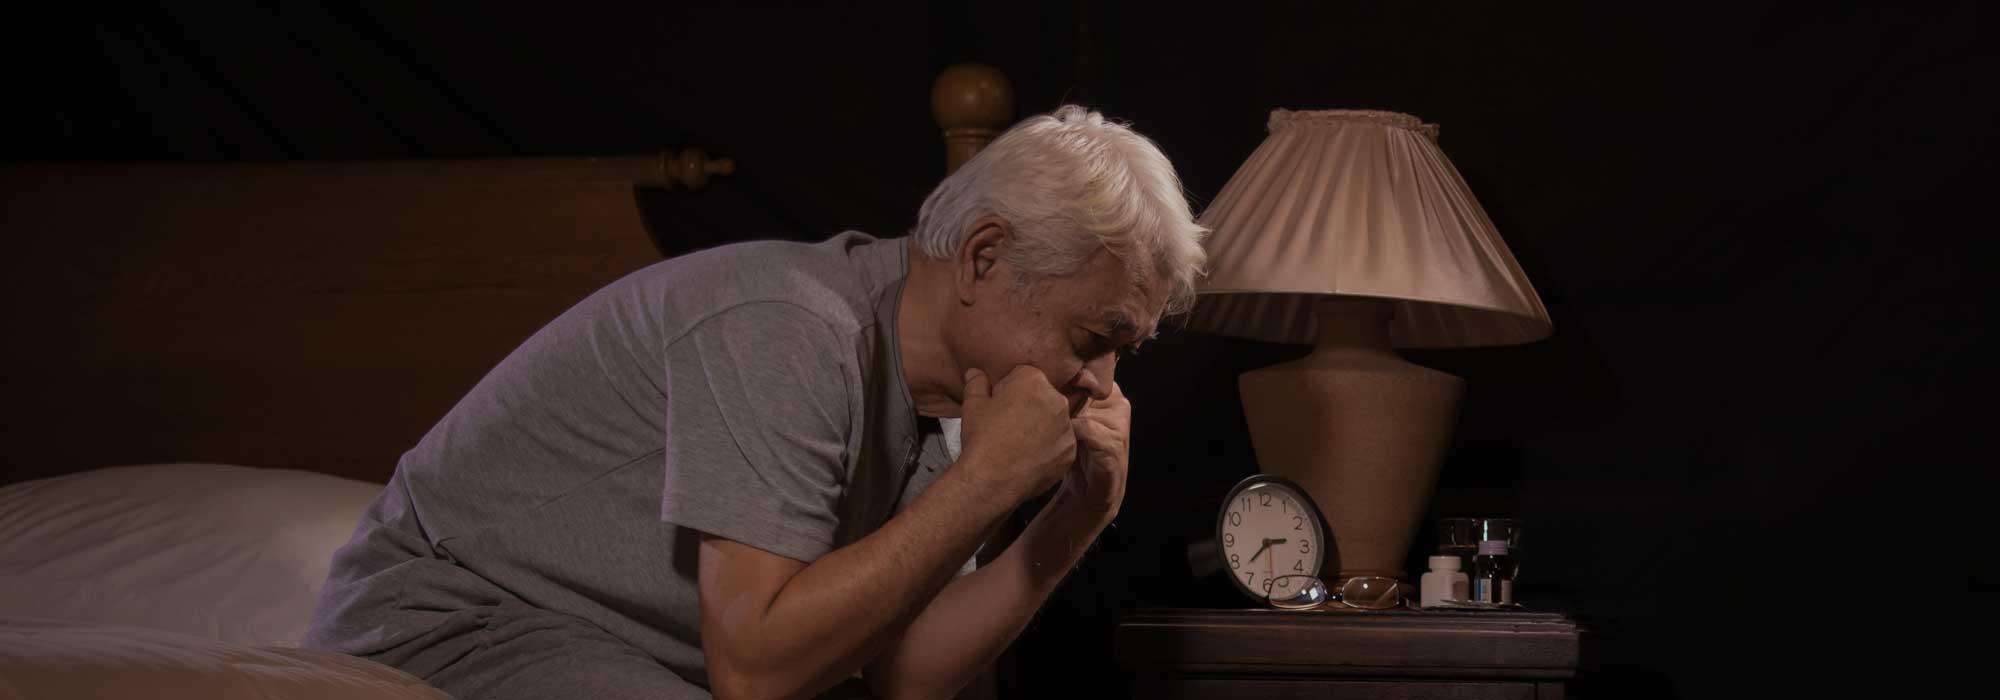 Depressed senior Asian man sitting on edge of the bed